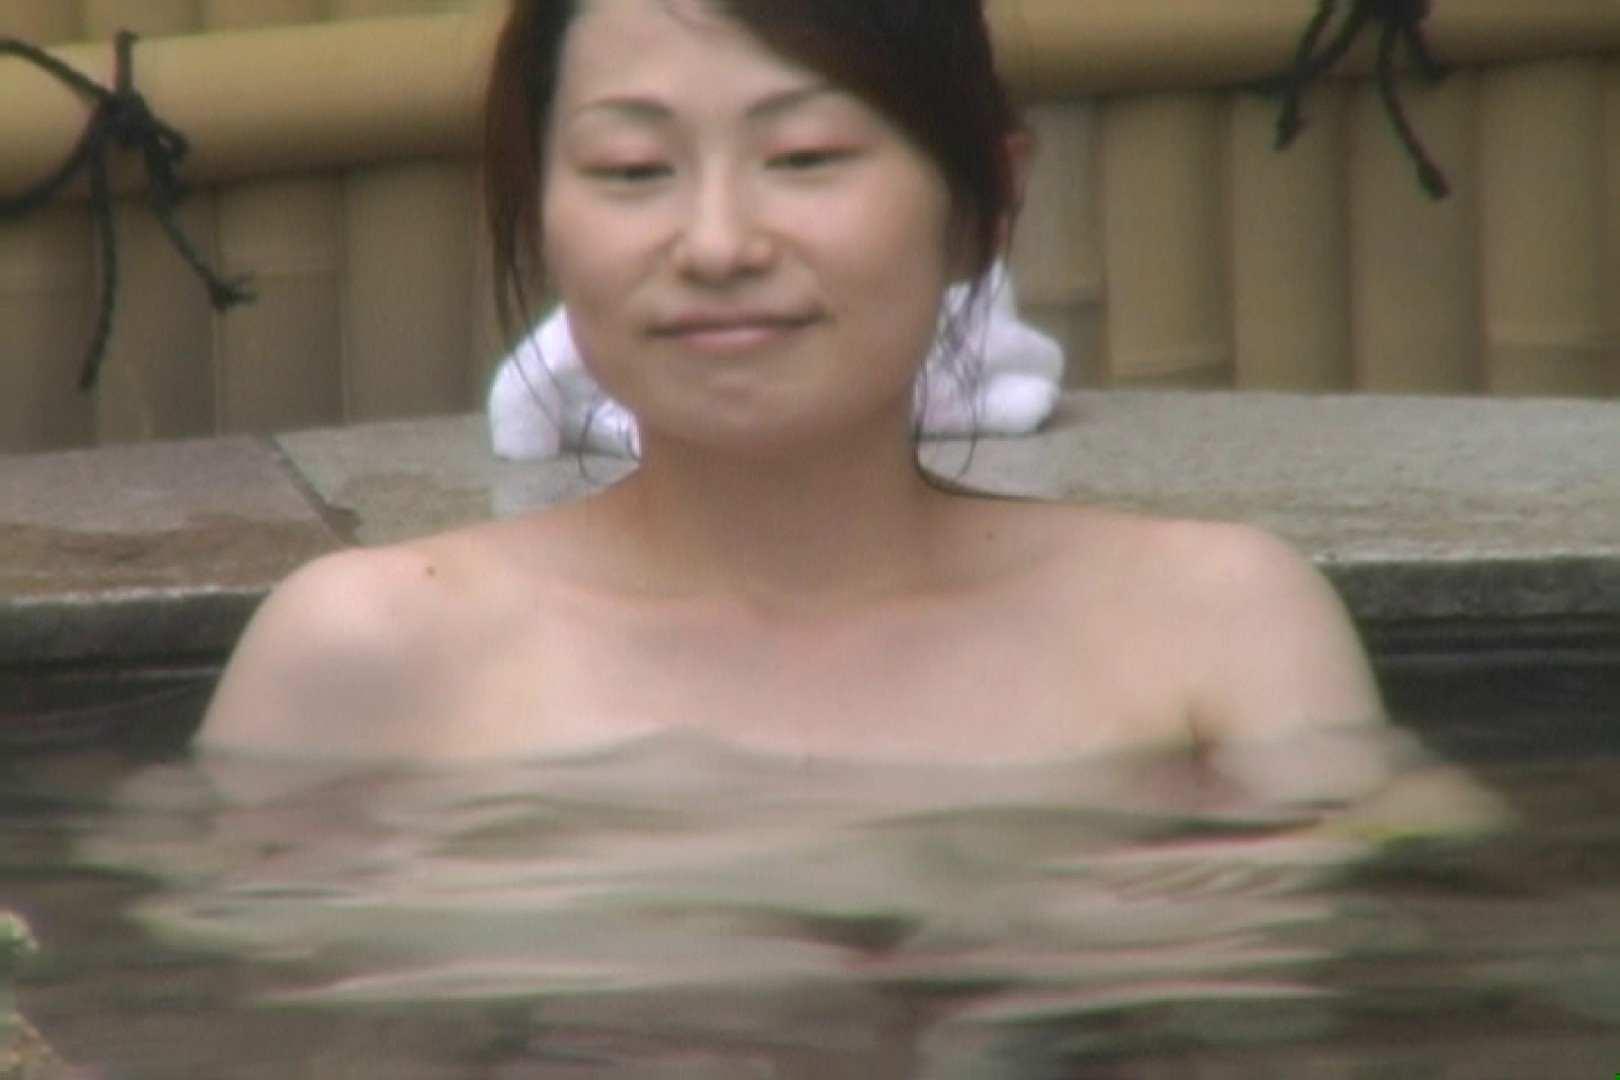 Aquaな露天風呂Vol.615 0   0  36連発 17